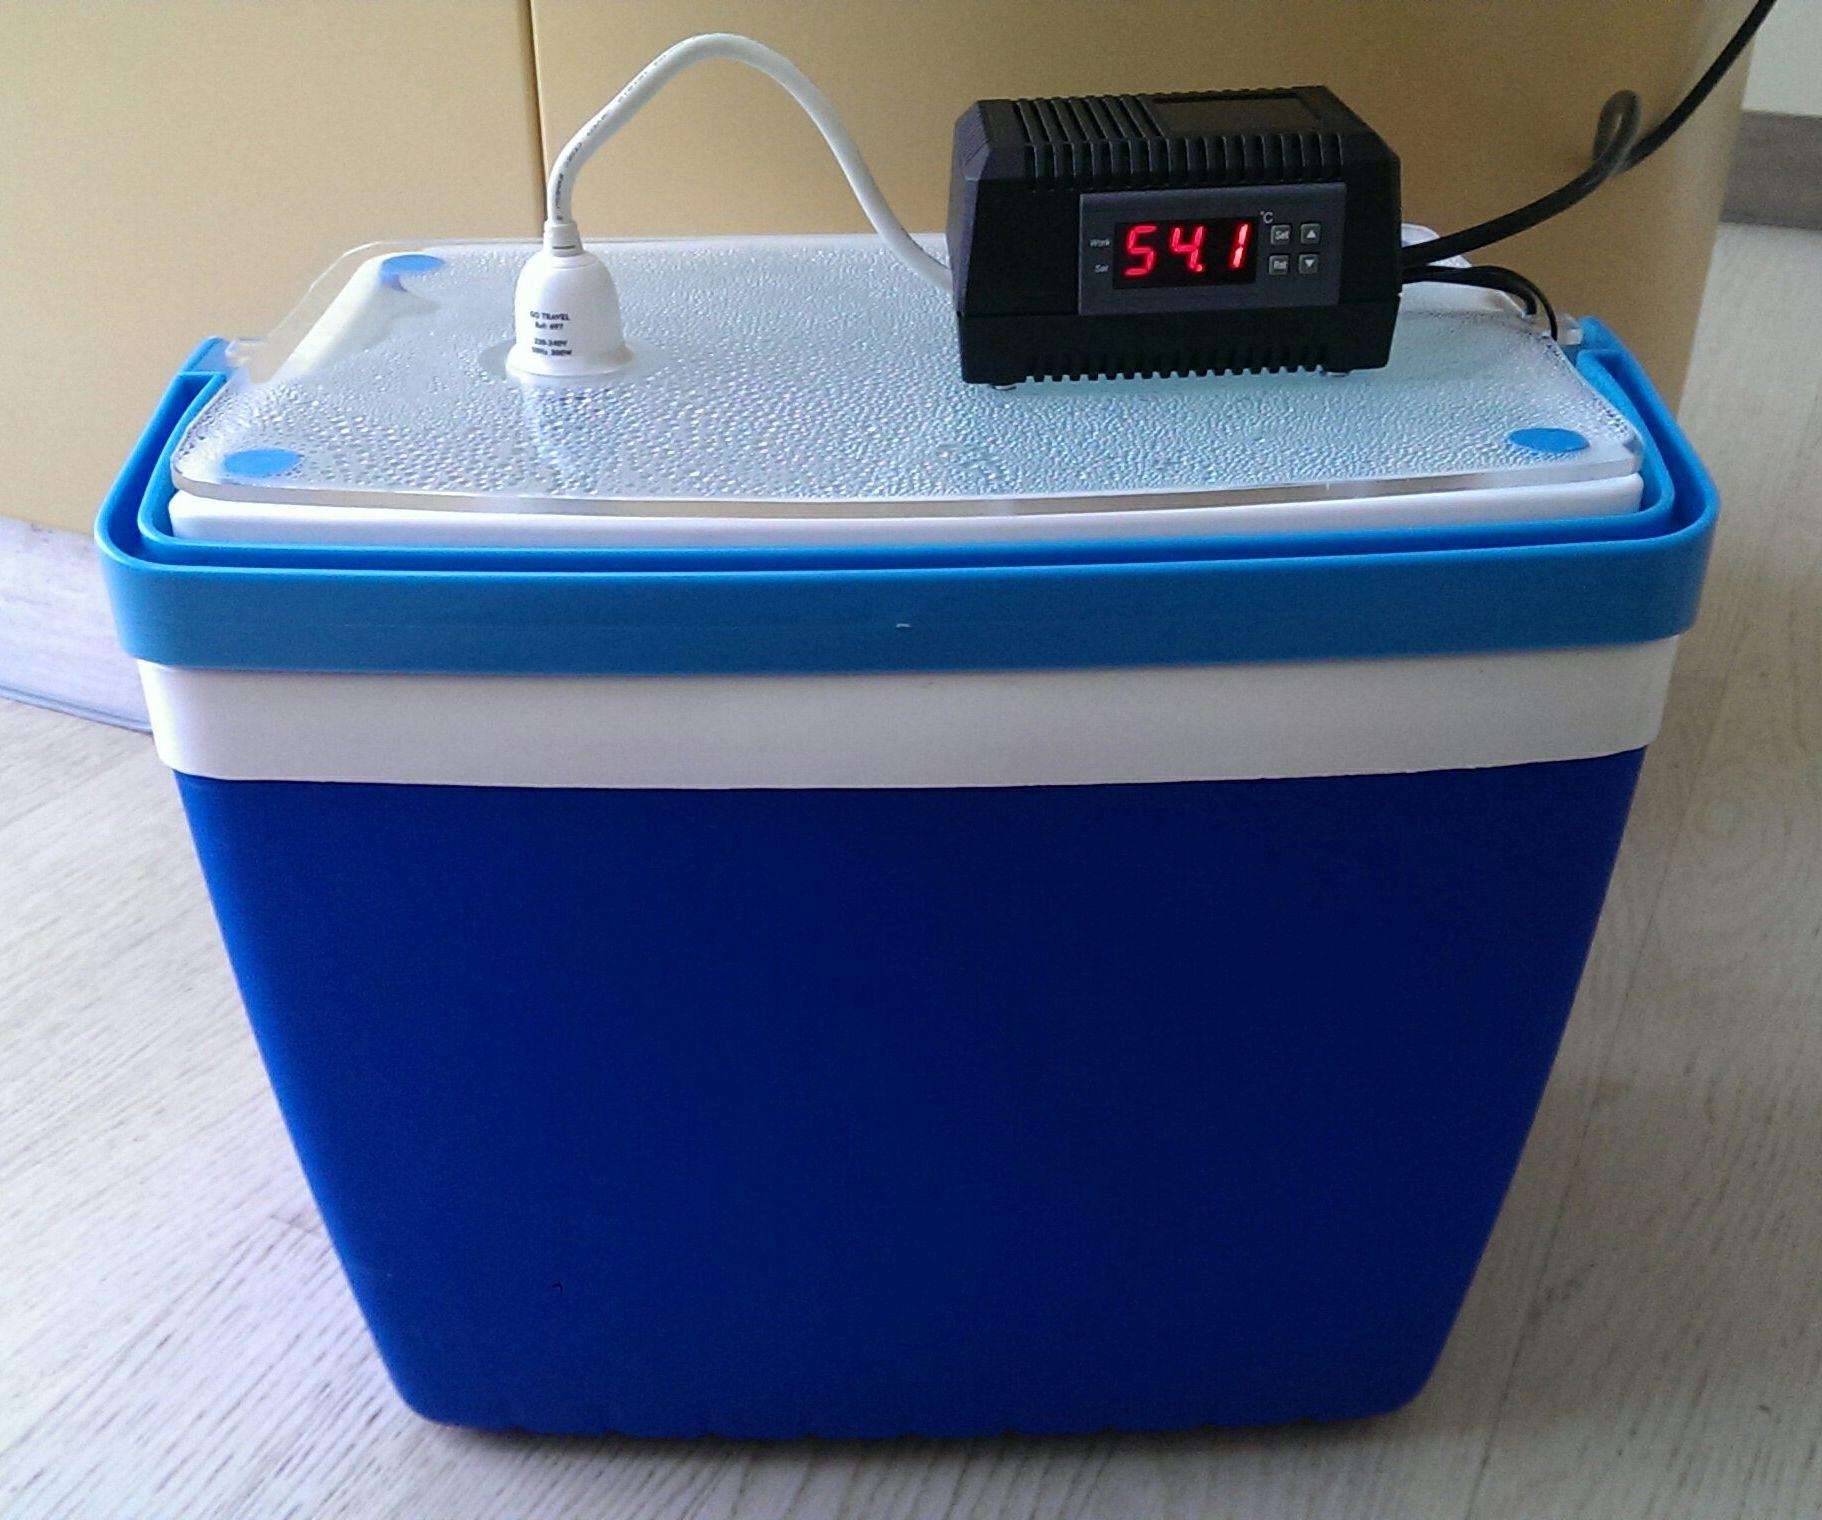 Sous-vide cooker / yoghurt incubator